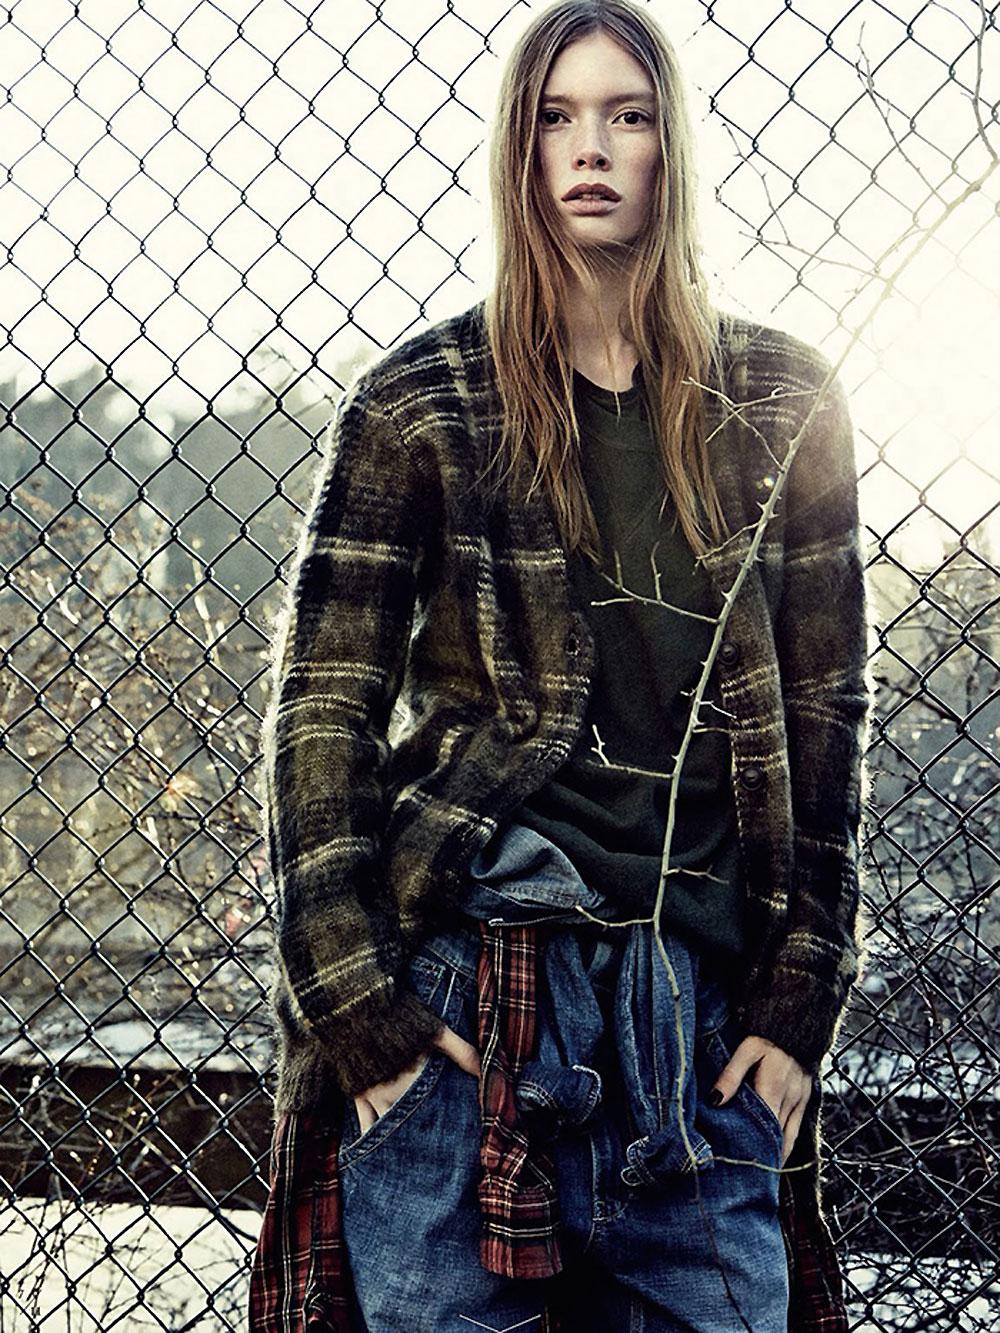 julia, hafstrom, model, andreas, sjodin, elle, sweden, fasion, magazine, oracle, fox